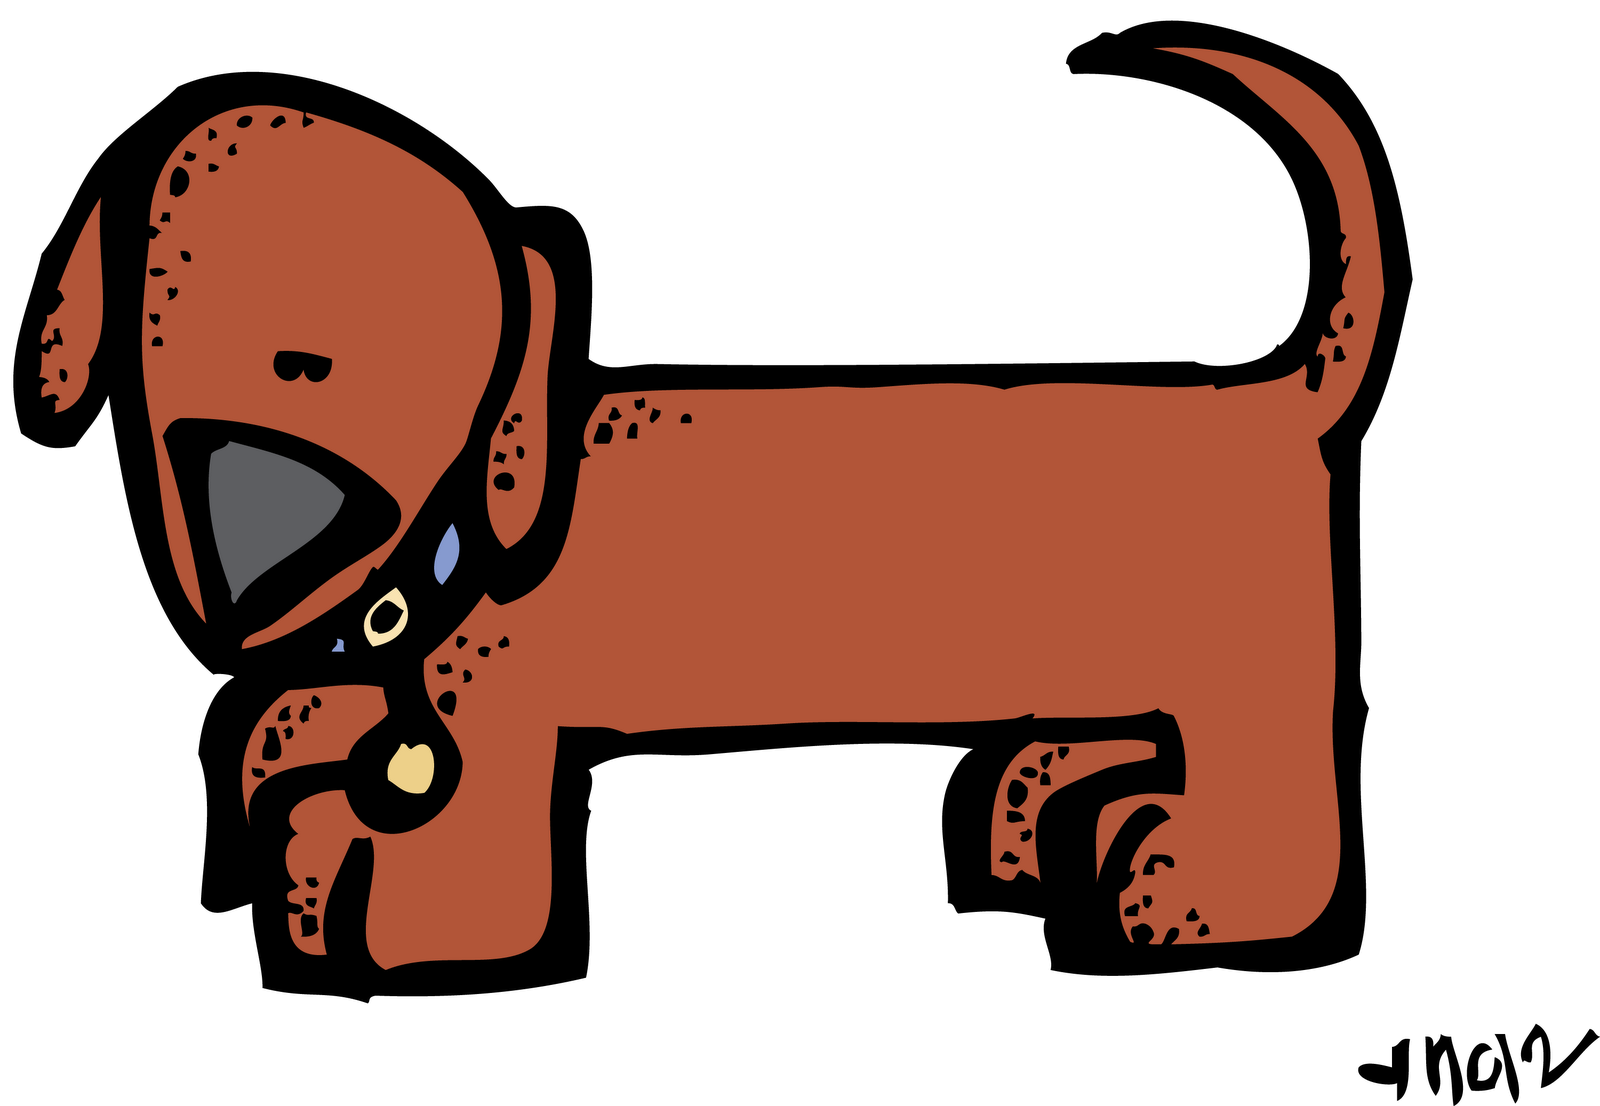 Dog surfing clipart png freeuse download MelonHeadz: A request from Jennifer | Melonheadz | Pinterest | Clip ... png freeuse download